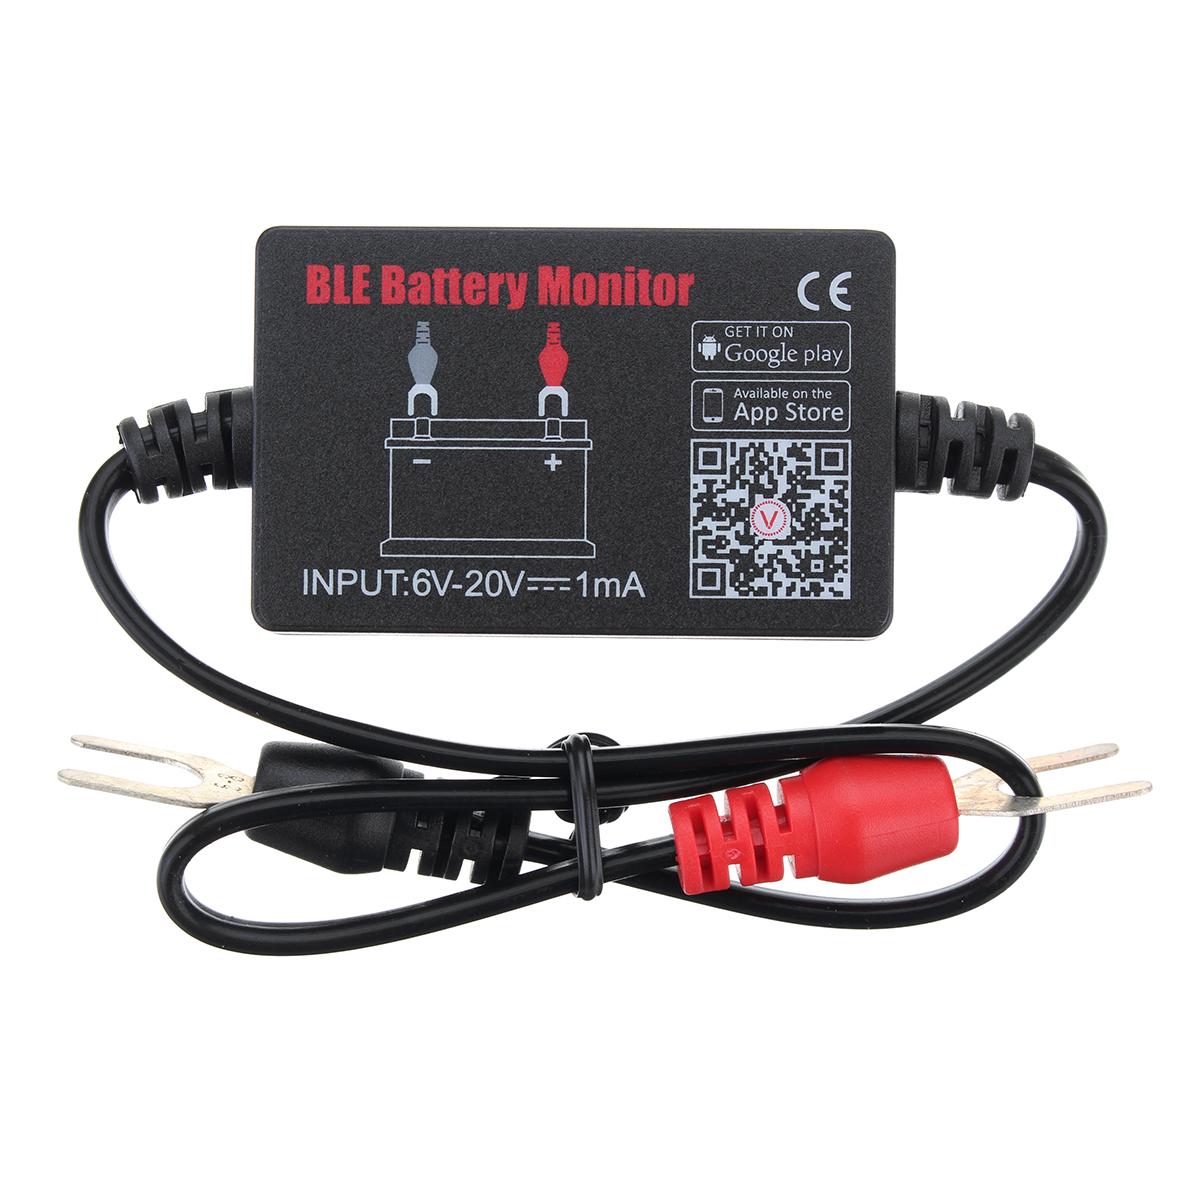 12V Car Battery Minitor Tester BM2 Bluetooth 4.0 Device for 6V-20V Vehicle